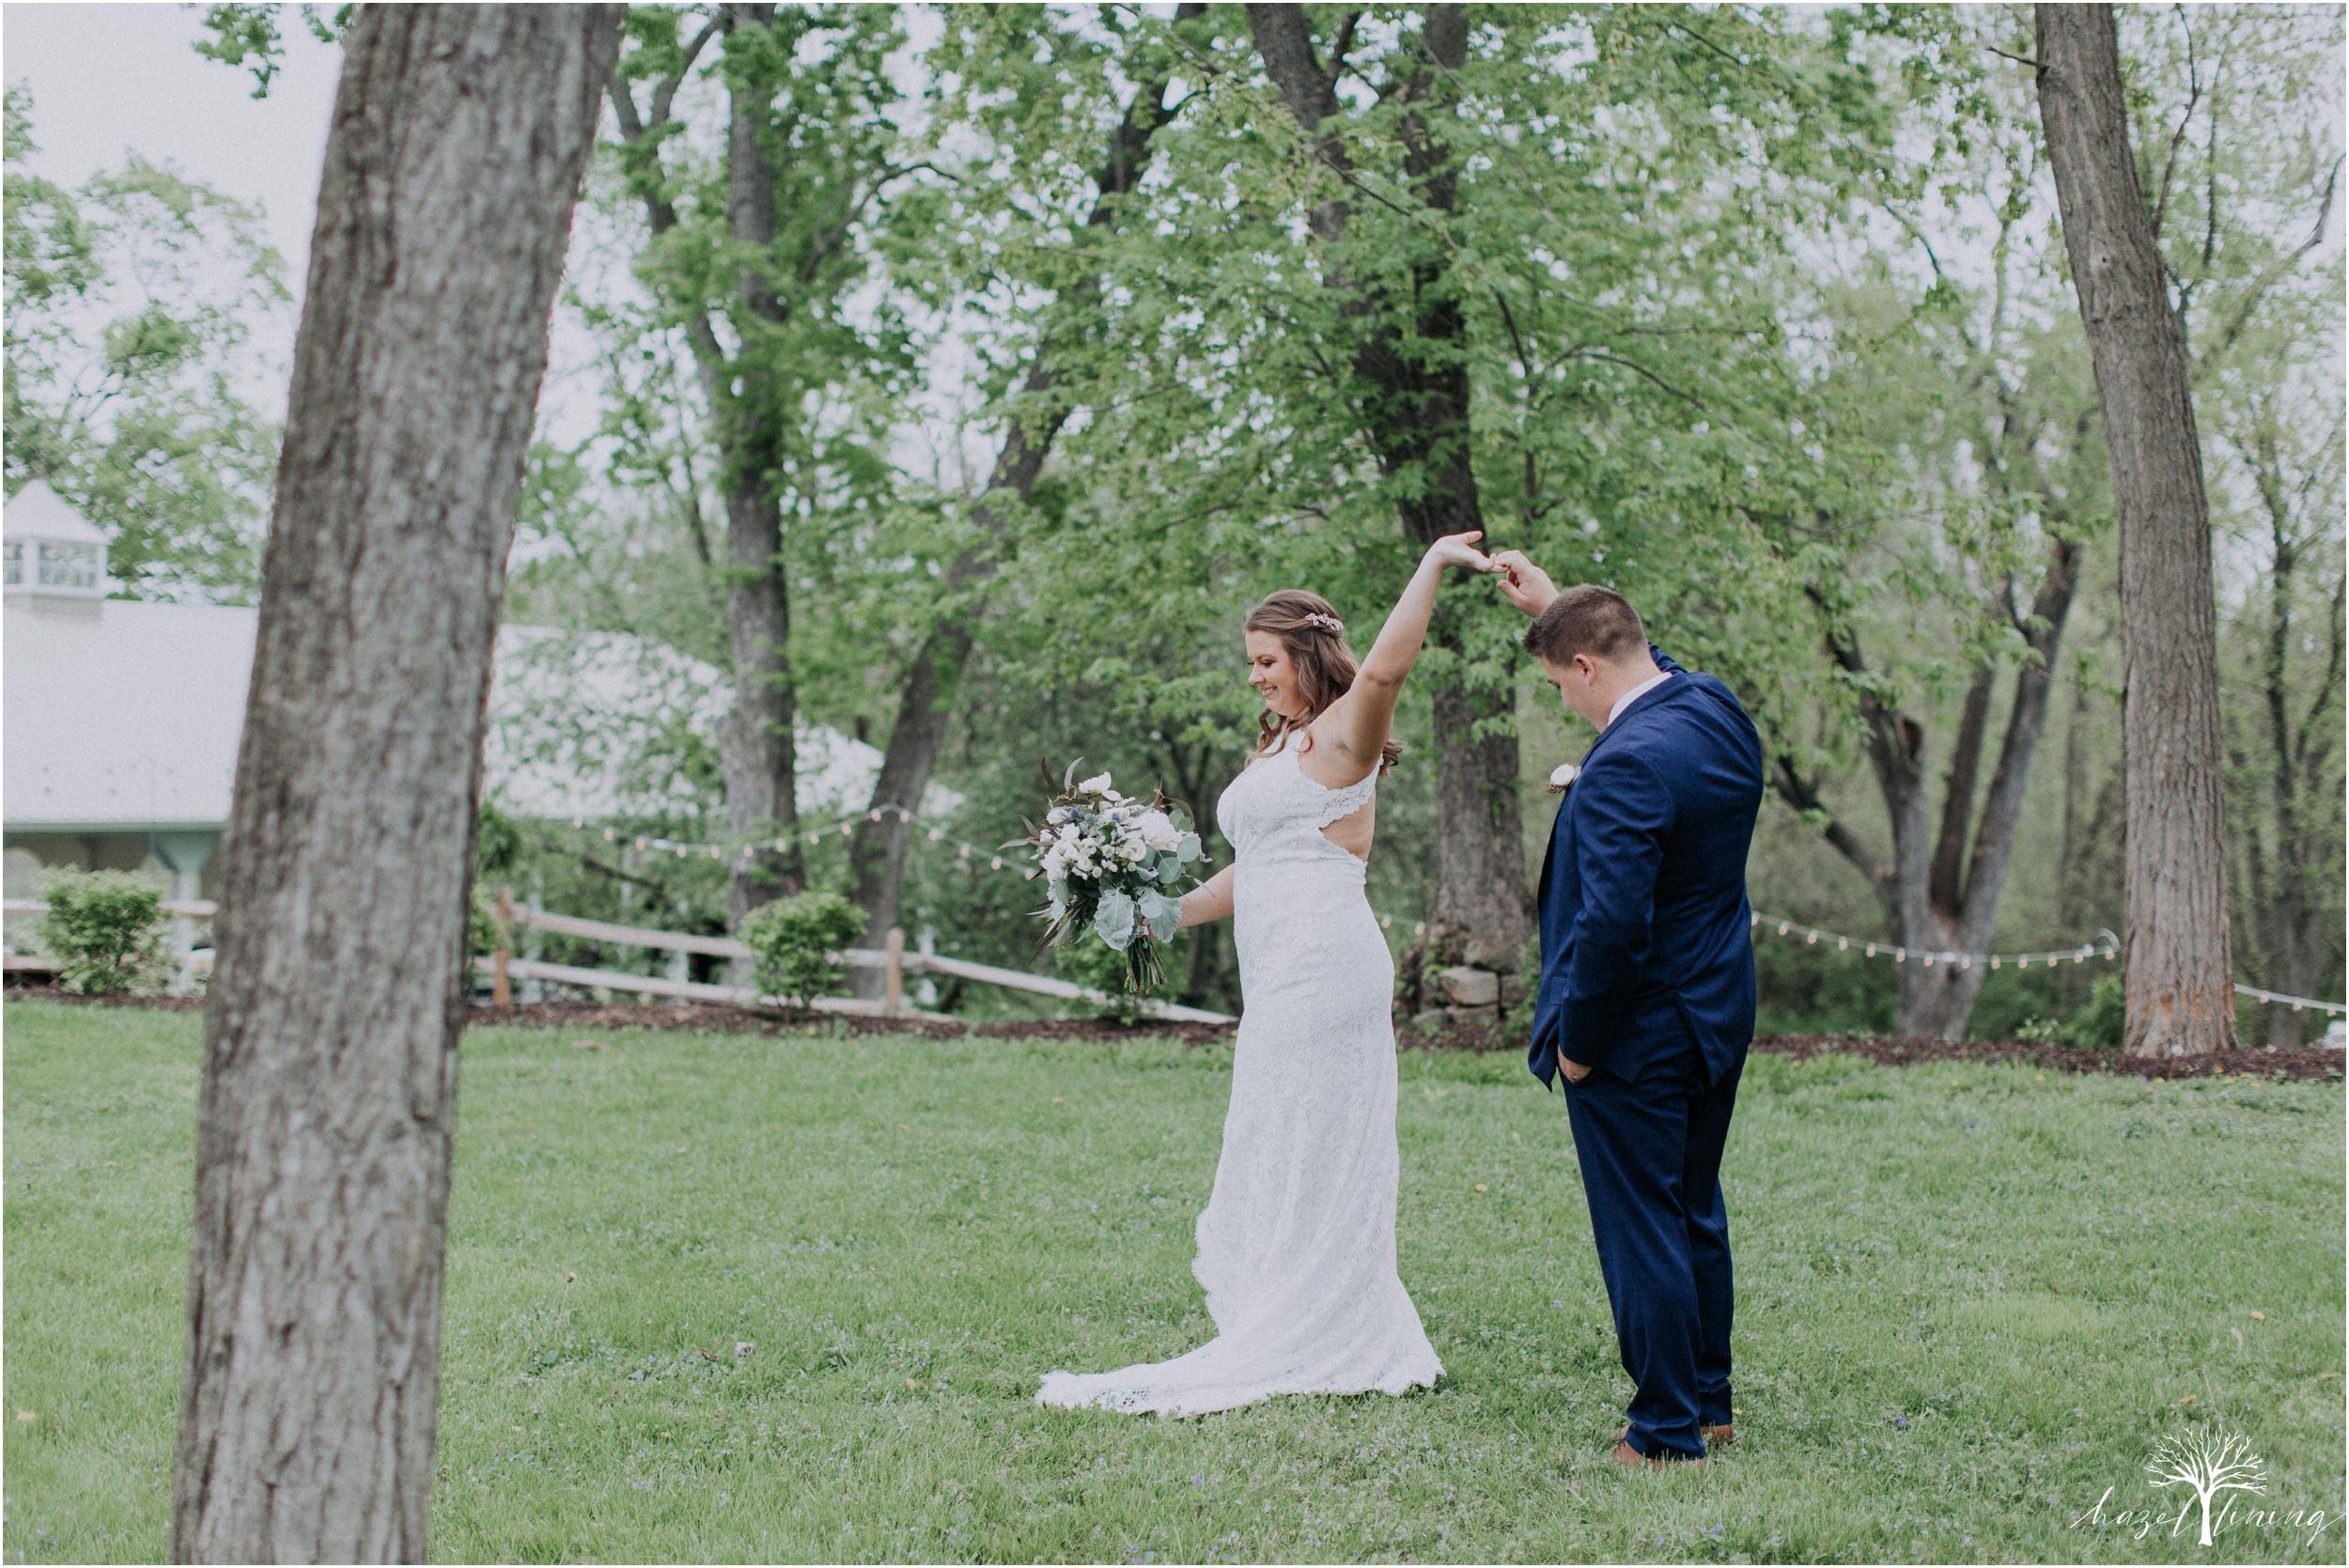 hazel-lining-travel-wedding-elopement-photography-abby-skyler-hunt-the-willis-house-york-pennsylvania-outdoor-estate-wedding_0026.jpg